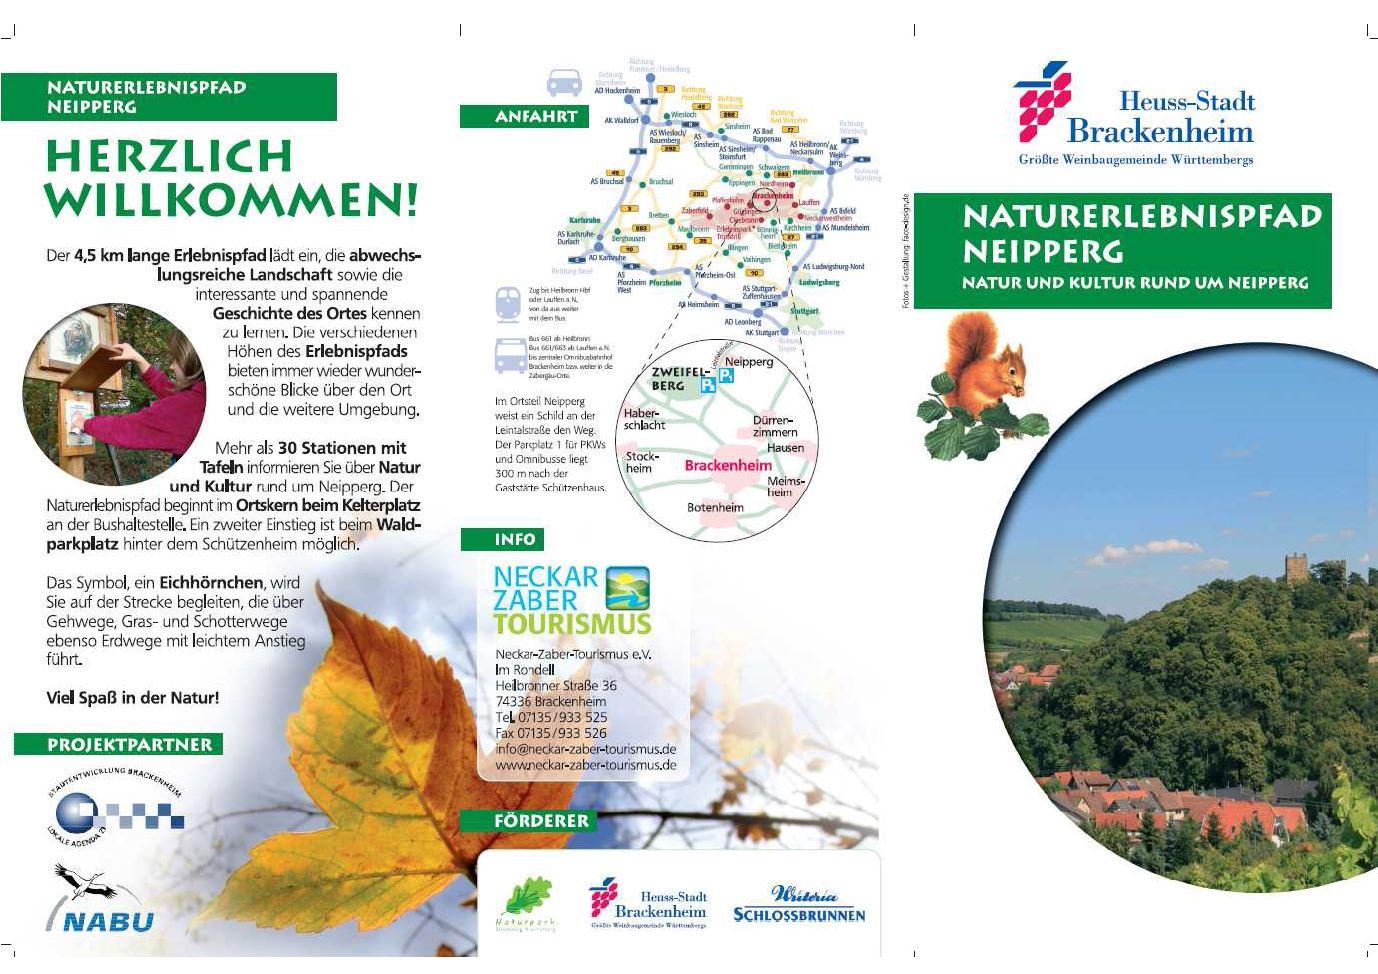 Flyer - Naturerlebnispfad Neipperg